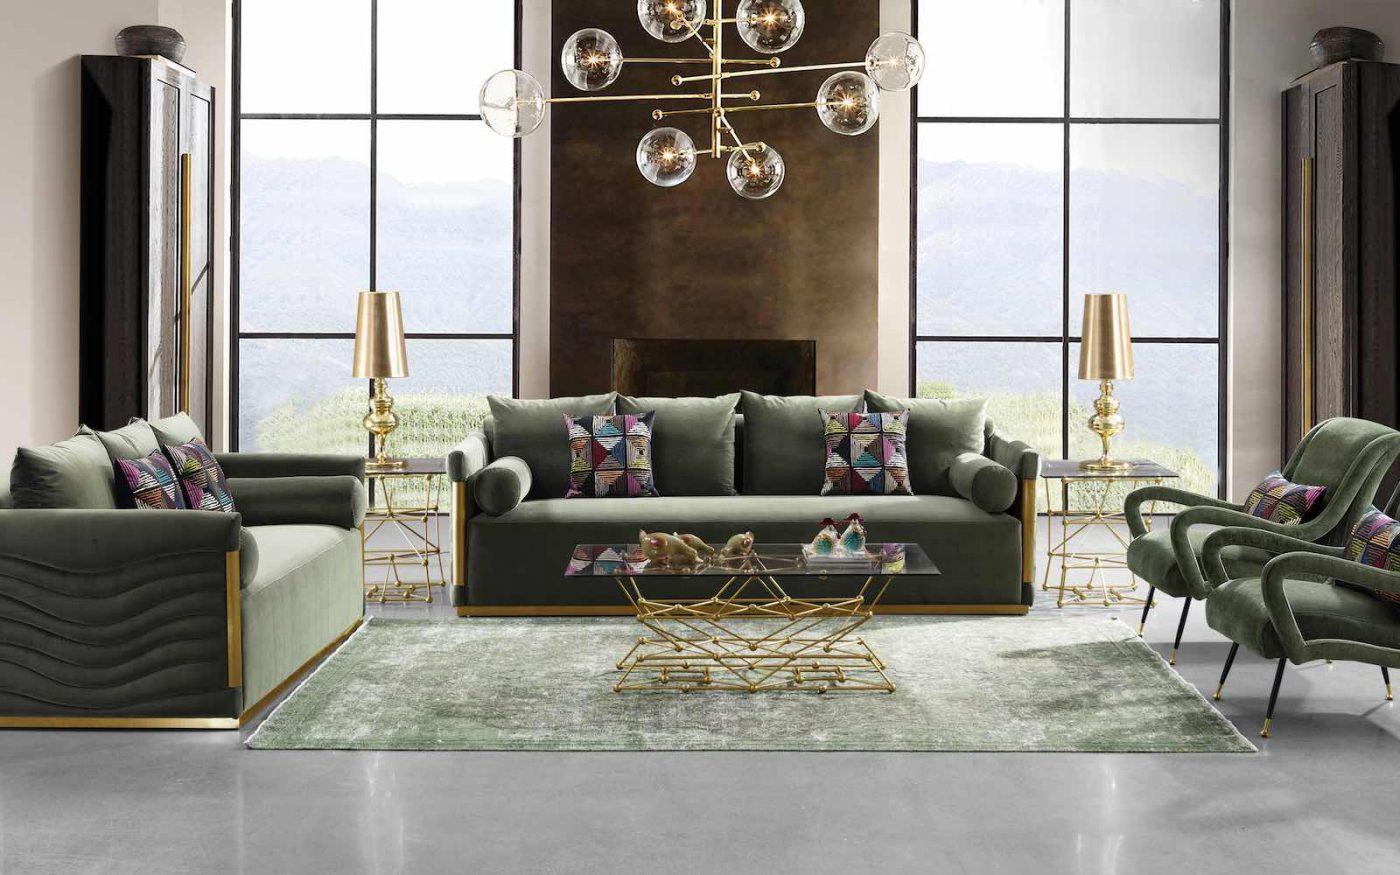 mazarin-ameublement-catalogue-produits-salon-tissu-26